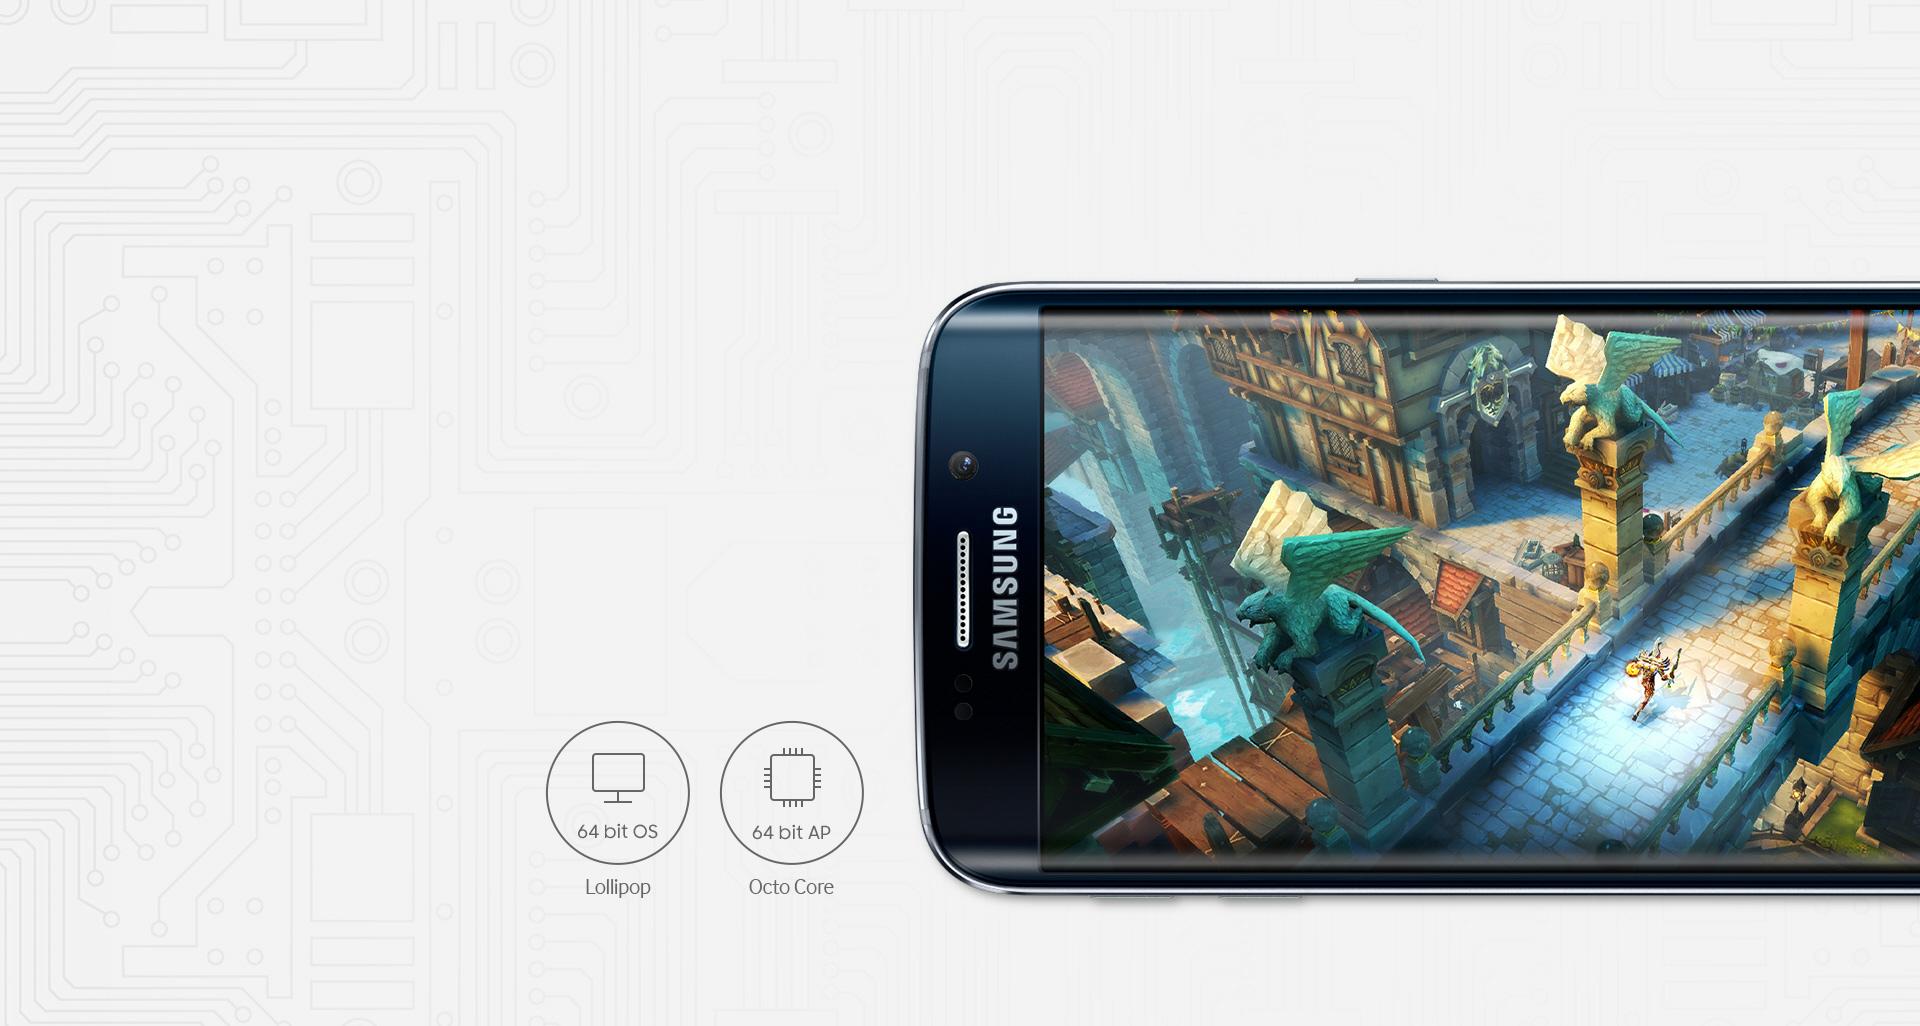 Processeur Galaxy S6 Edge